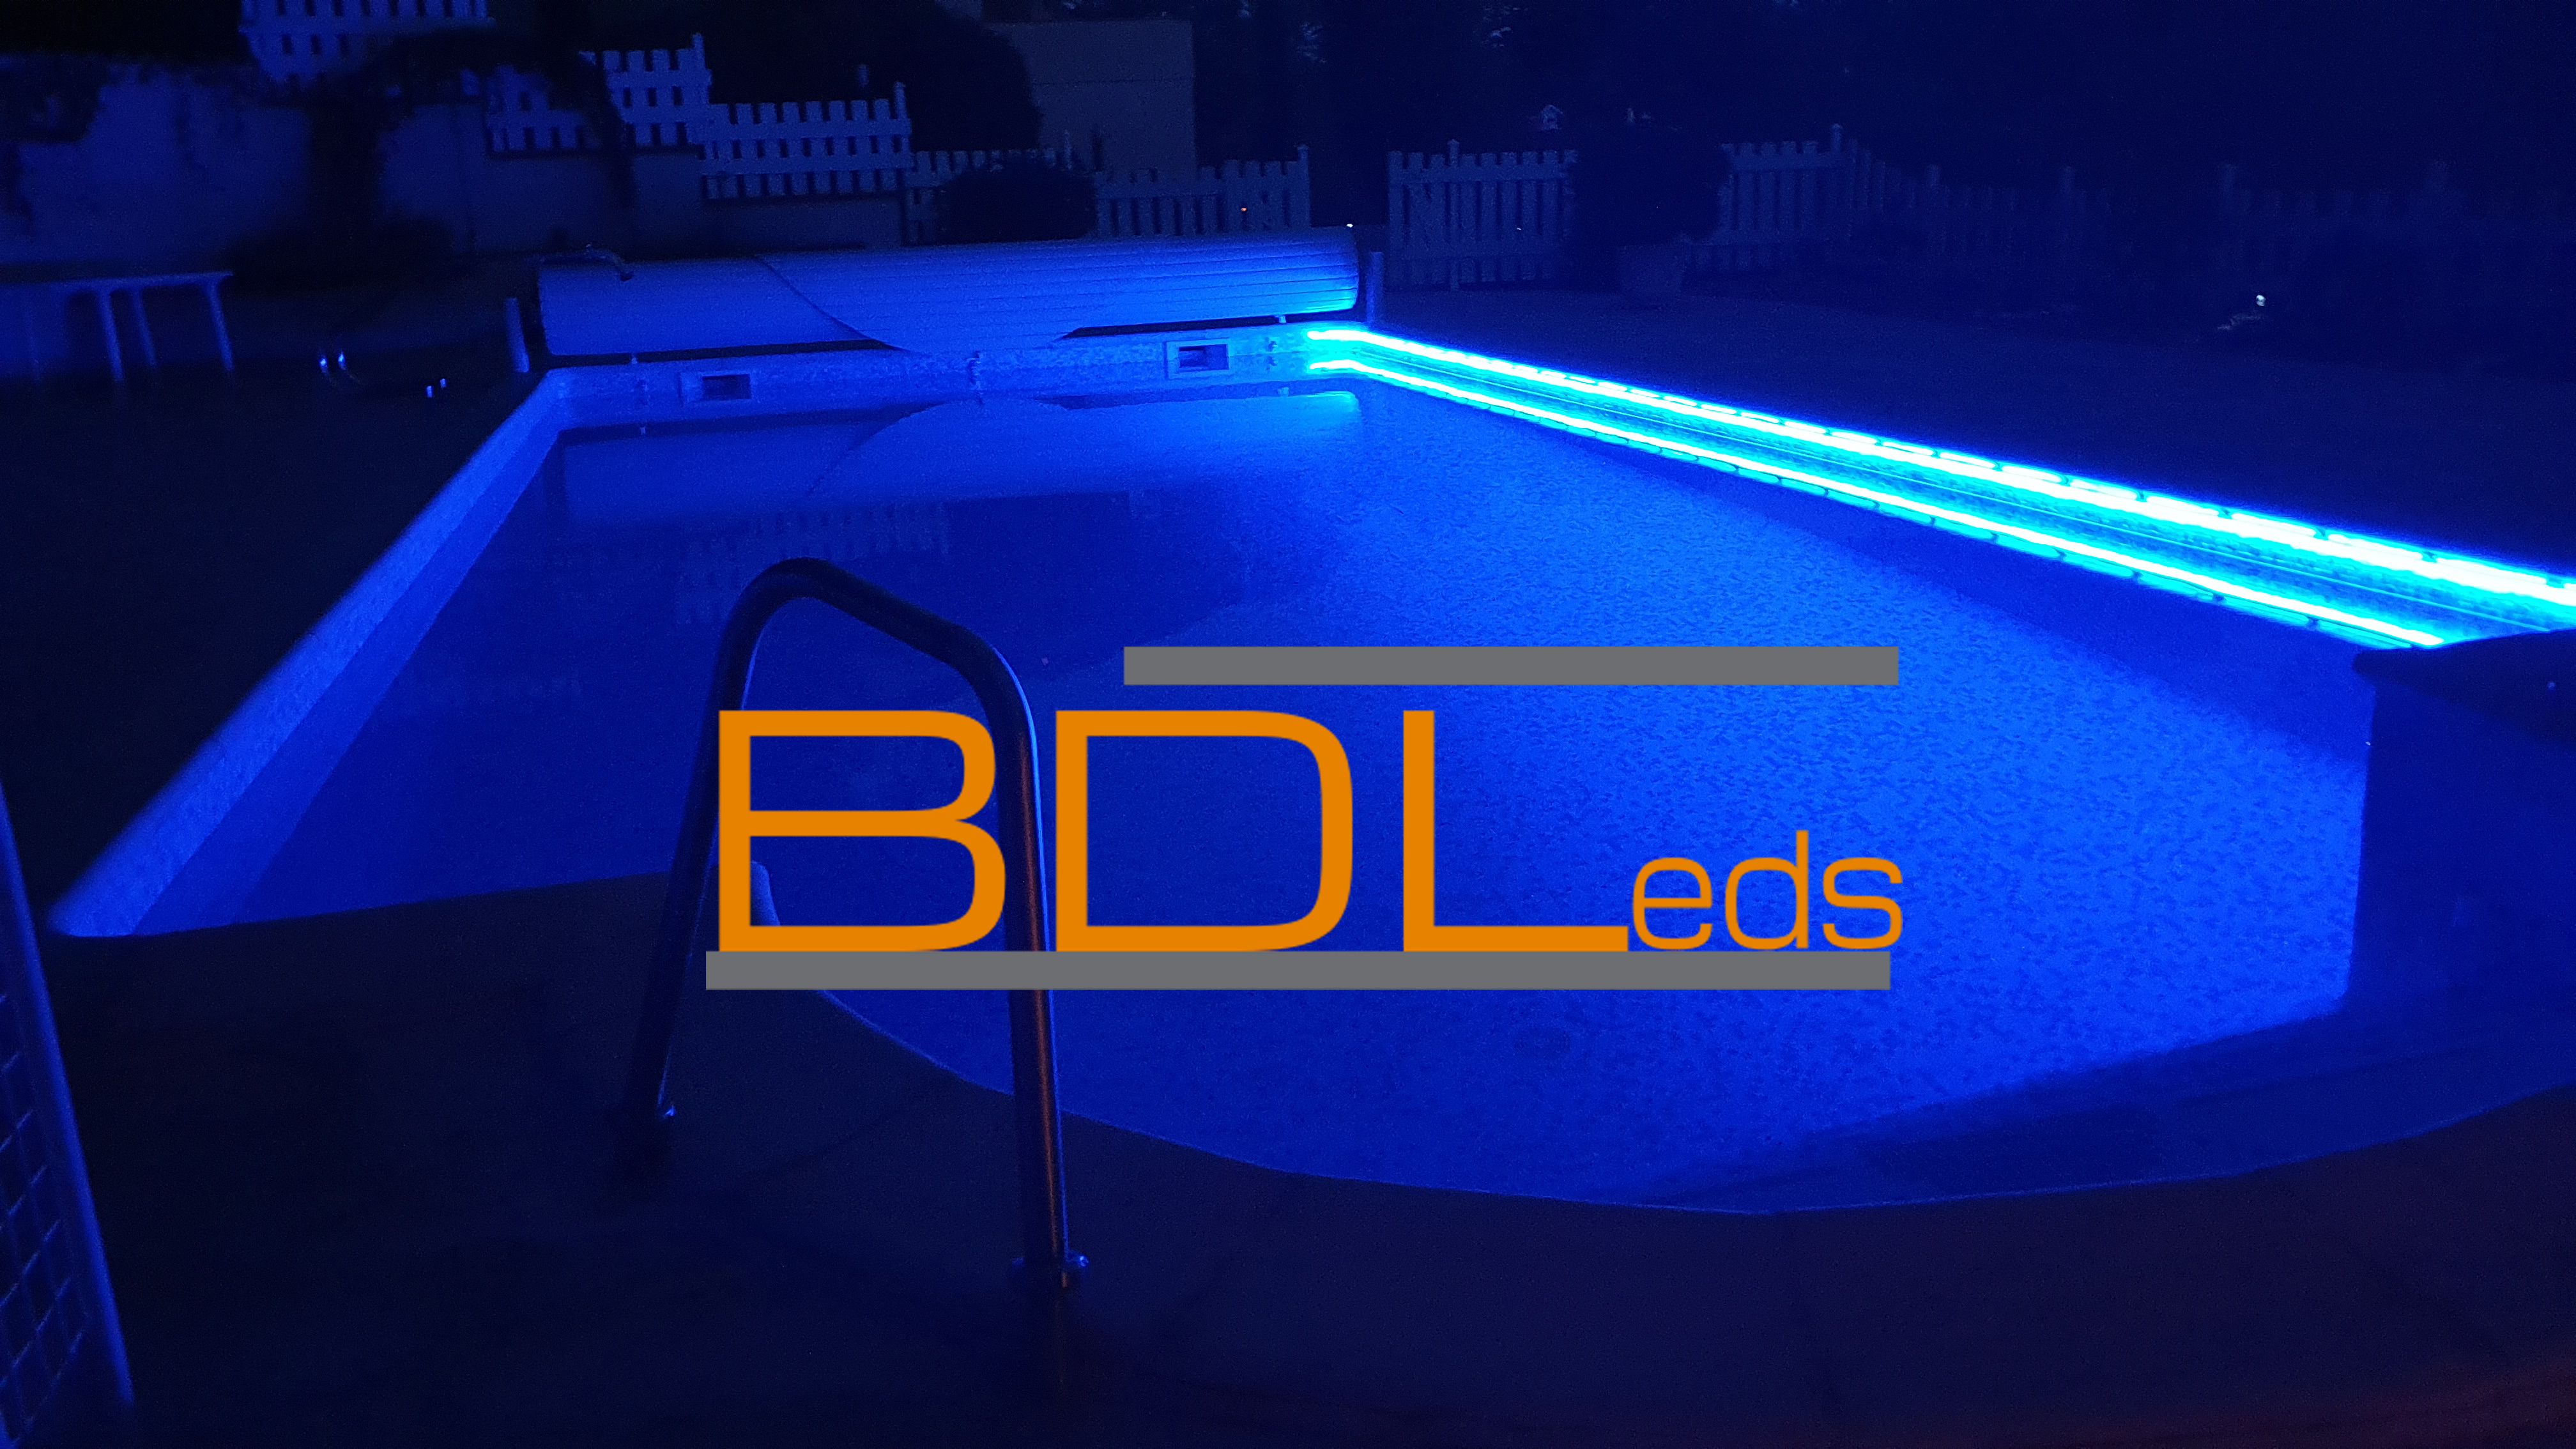 eclairage bleu piscine neon flexible led rgb